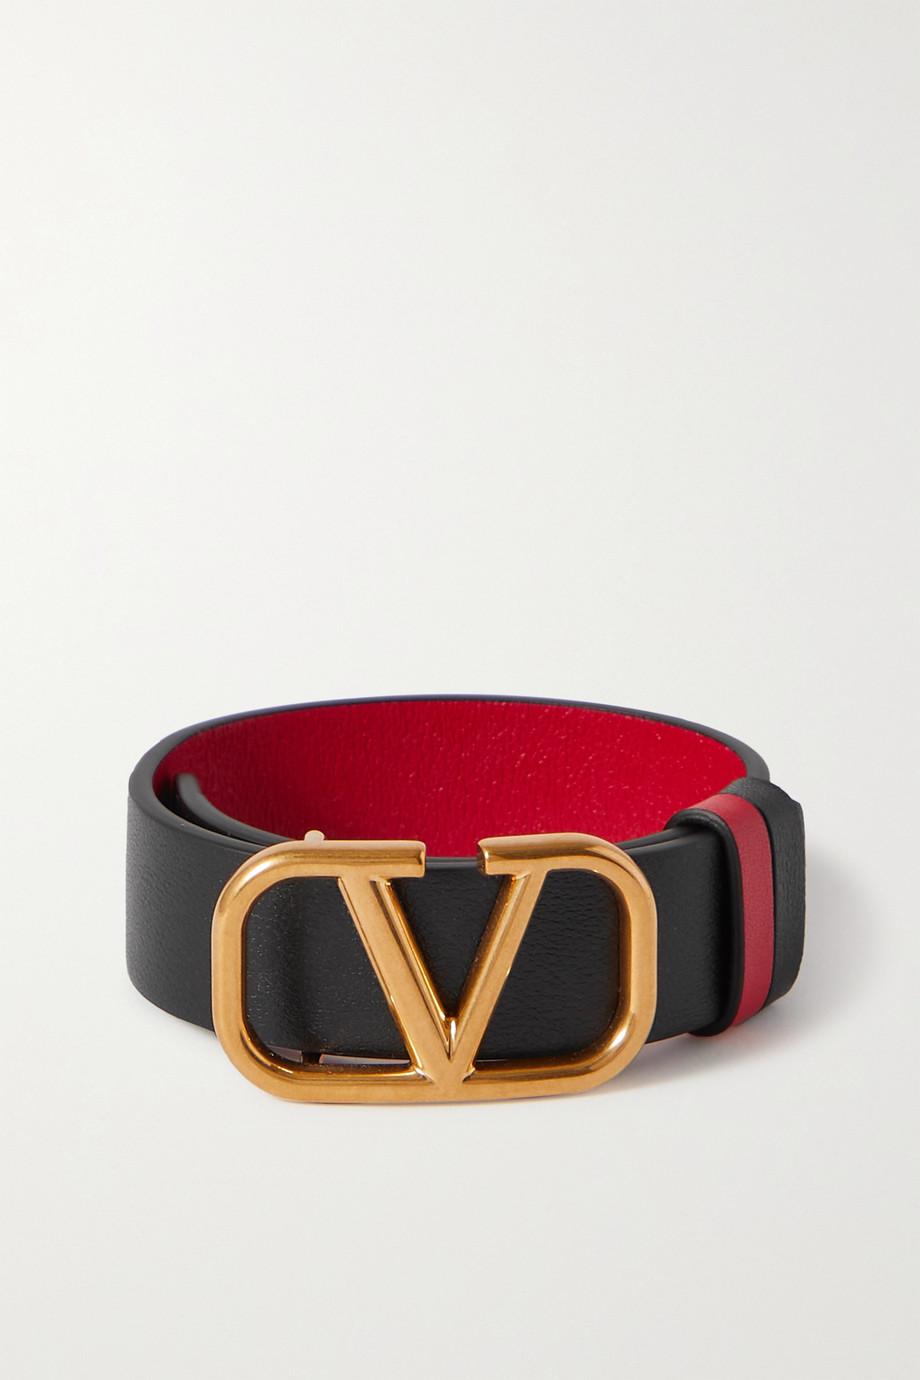 Valentino Bracelet réversible en cuir VLOGO Valentino Garavani